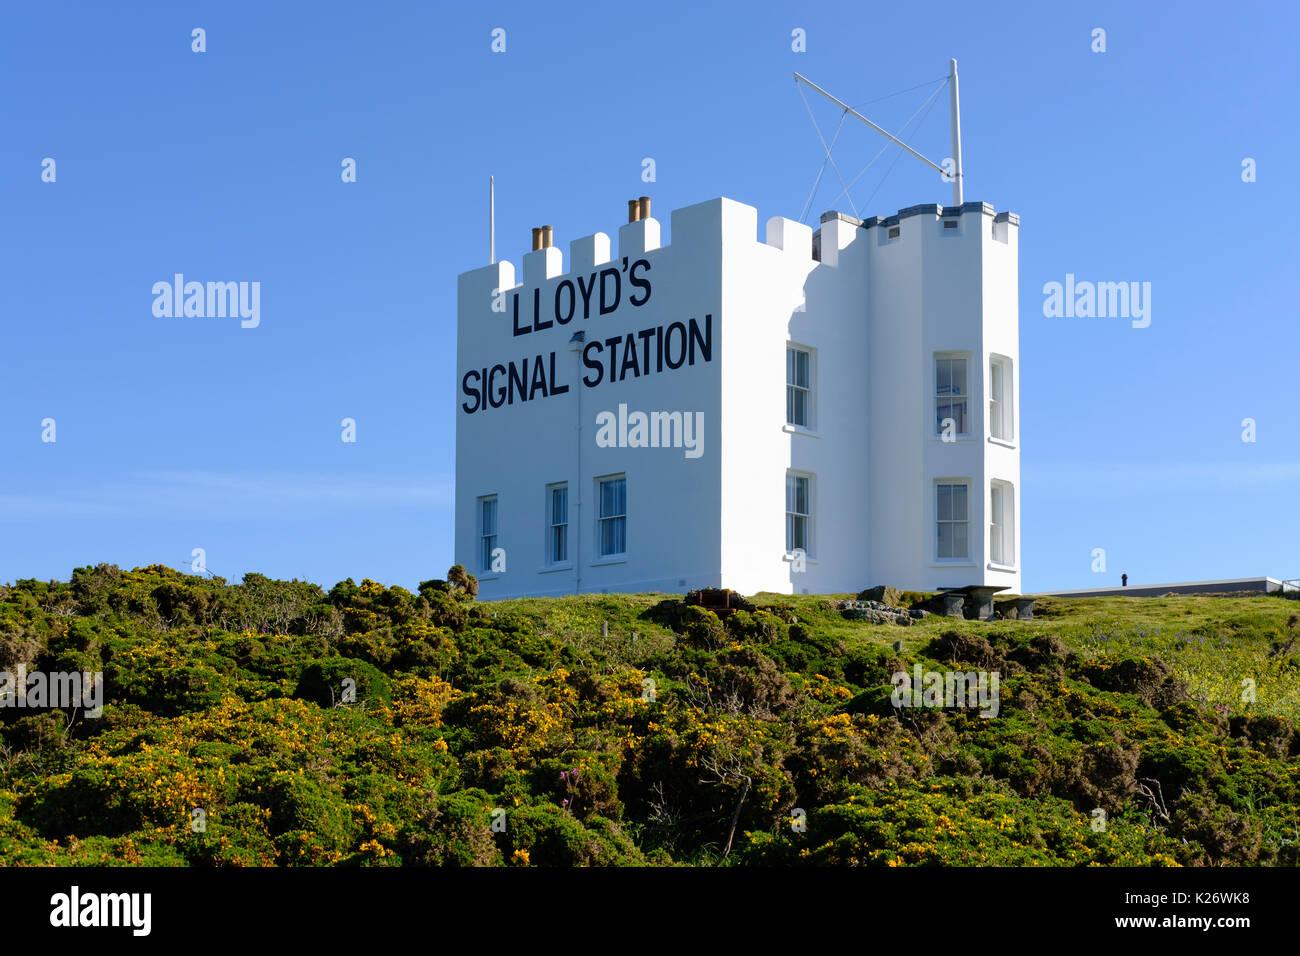 Lloyd's Signal Station, Lizard Peninsula, Cornwall, England, United Kingdom - Stock Image